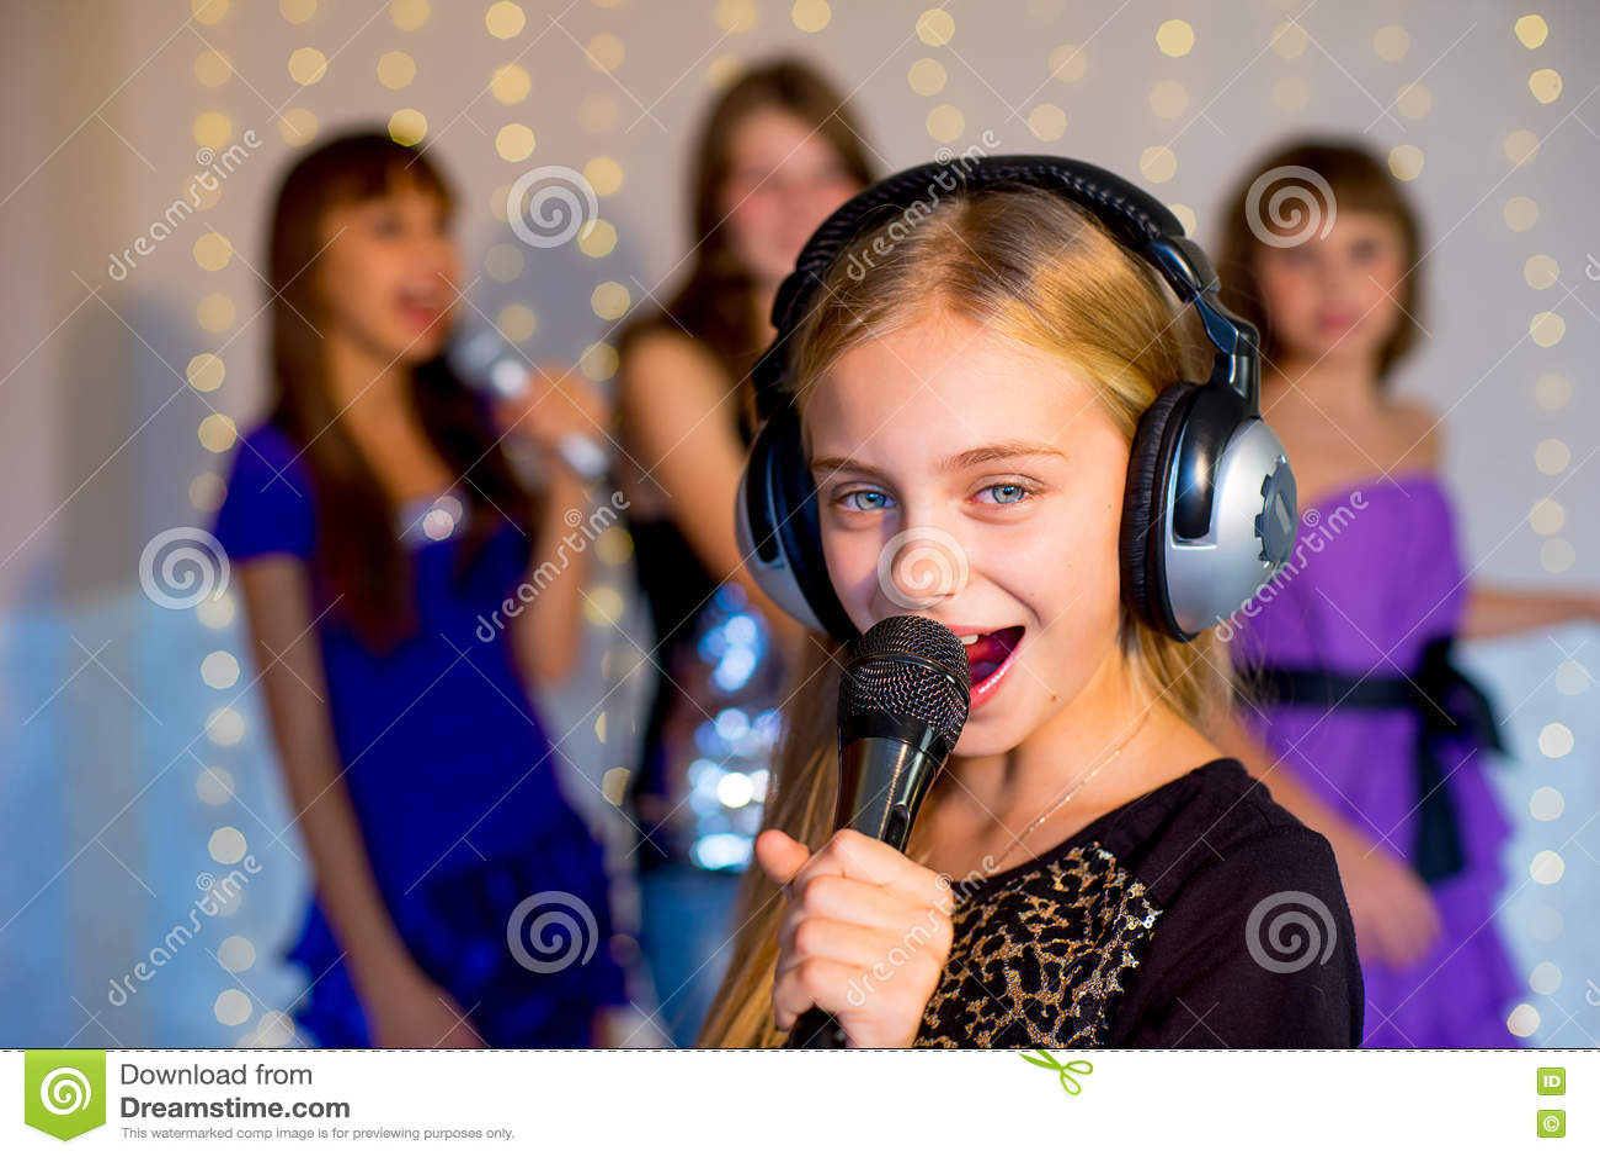 Group Of Happy Girls Singing On Karaoke Stock Image - Image